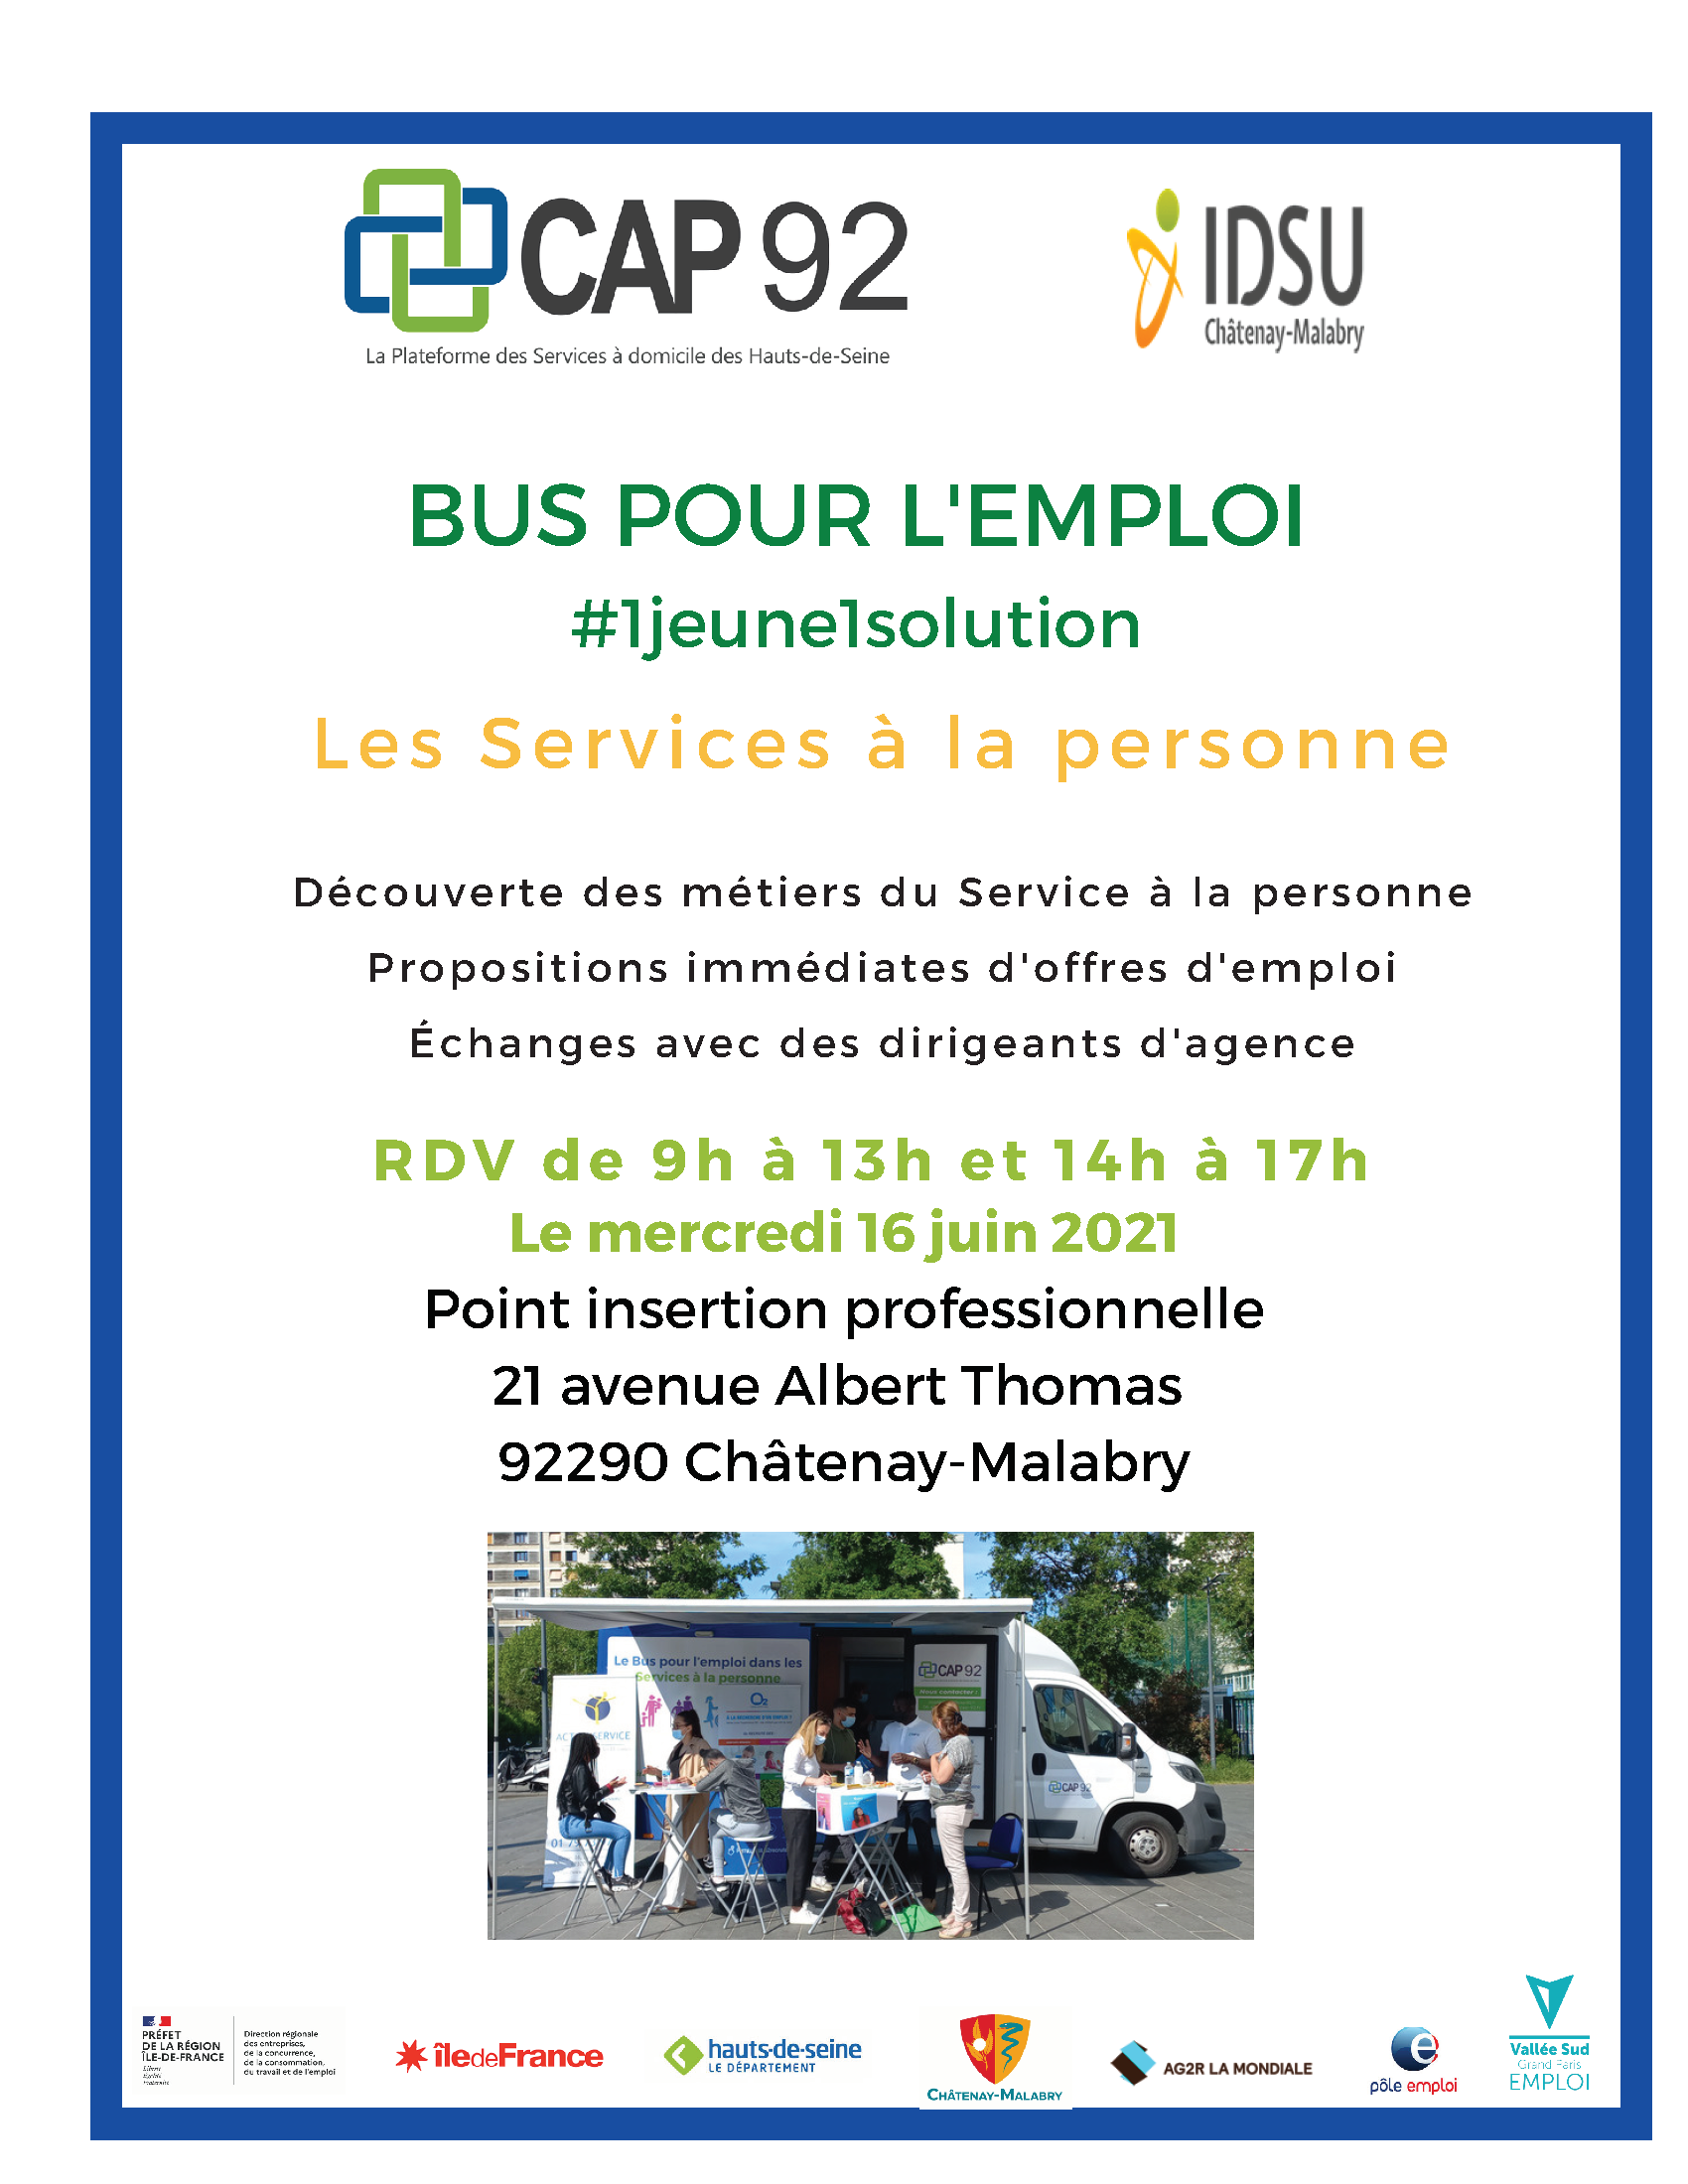 Vallée Sud Emploi bus Cap92 Châtenay-Malabry